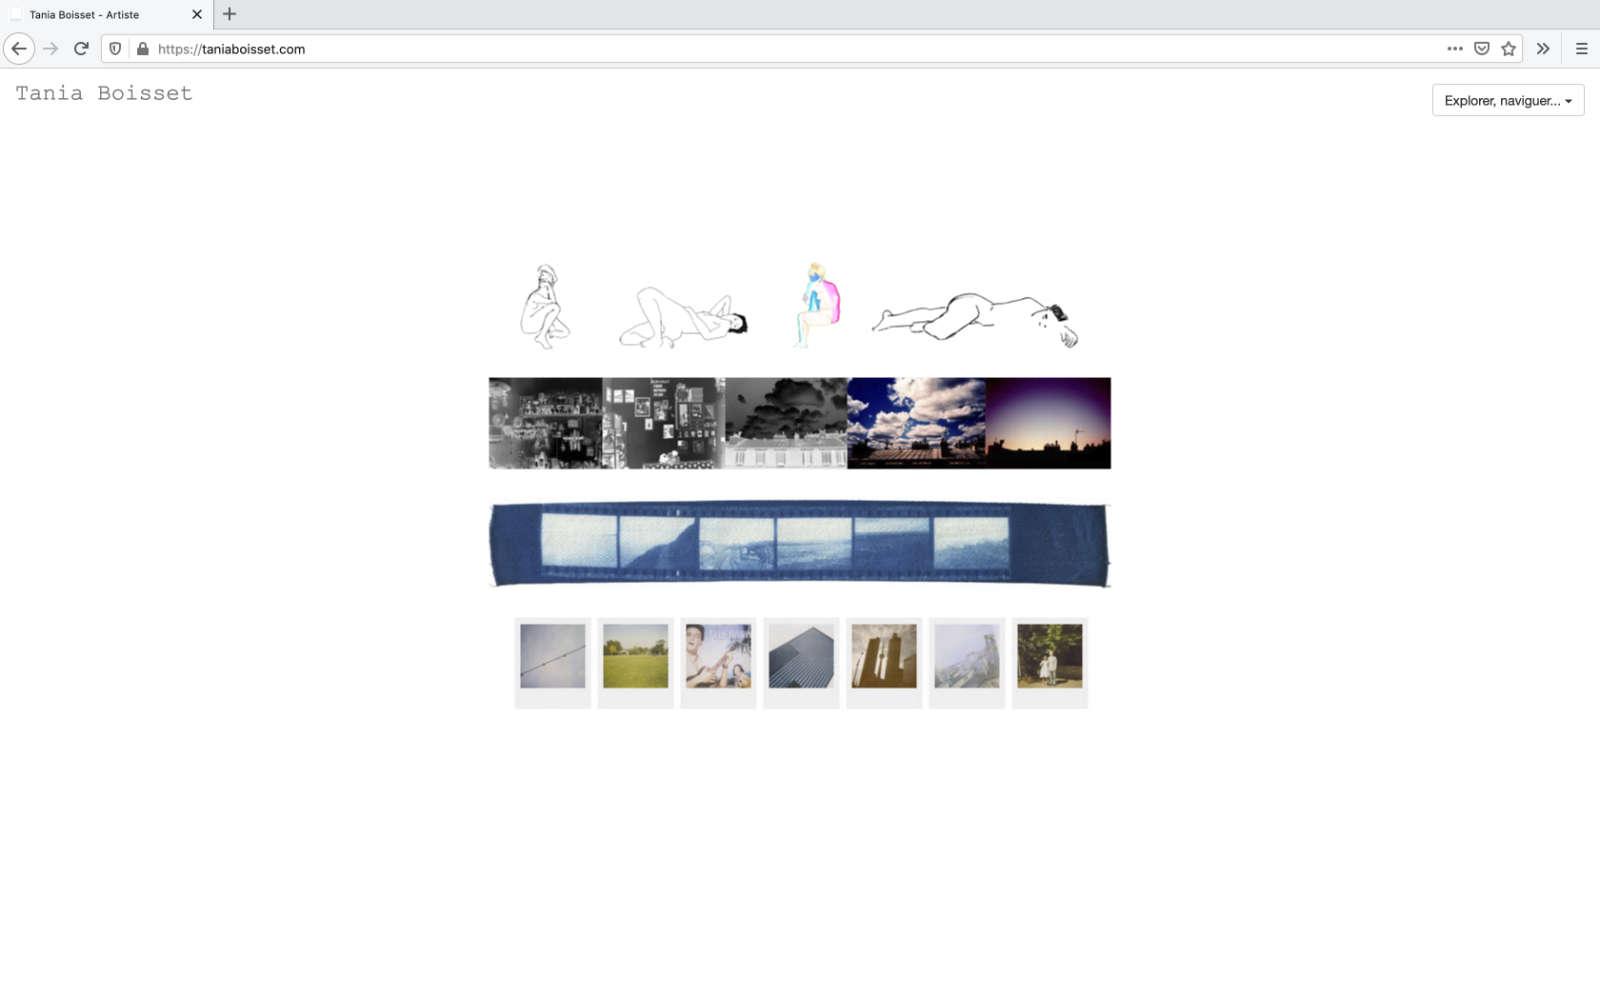 Website von Tania Boisset